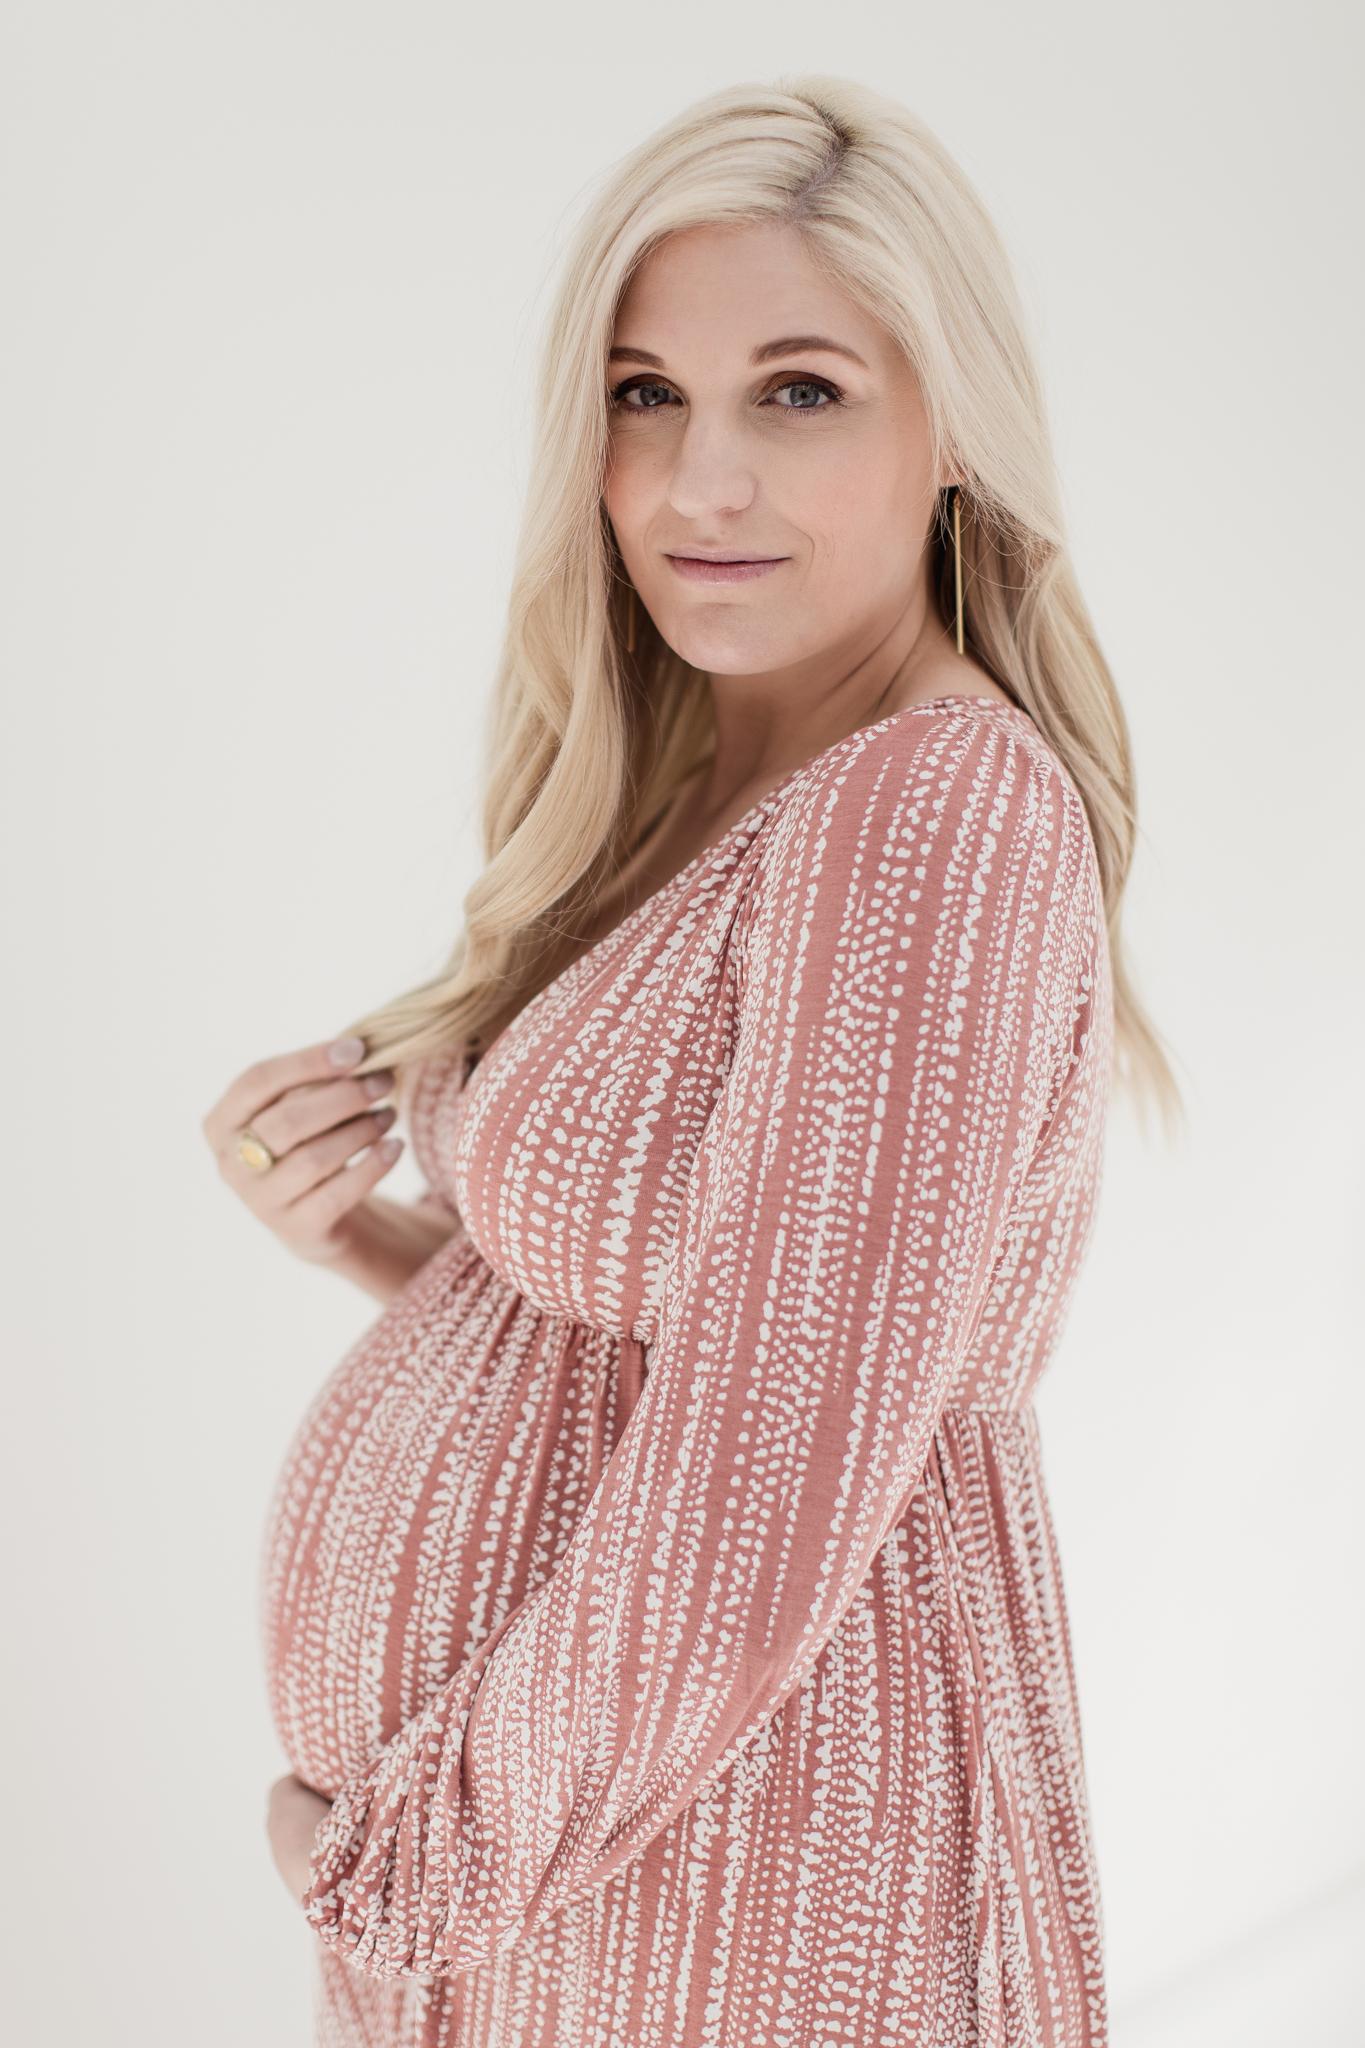 maternity-photographer-dallas-dfw-004.jpg